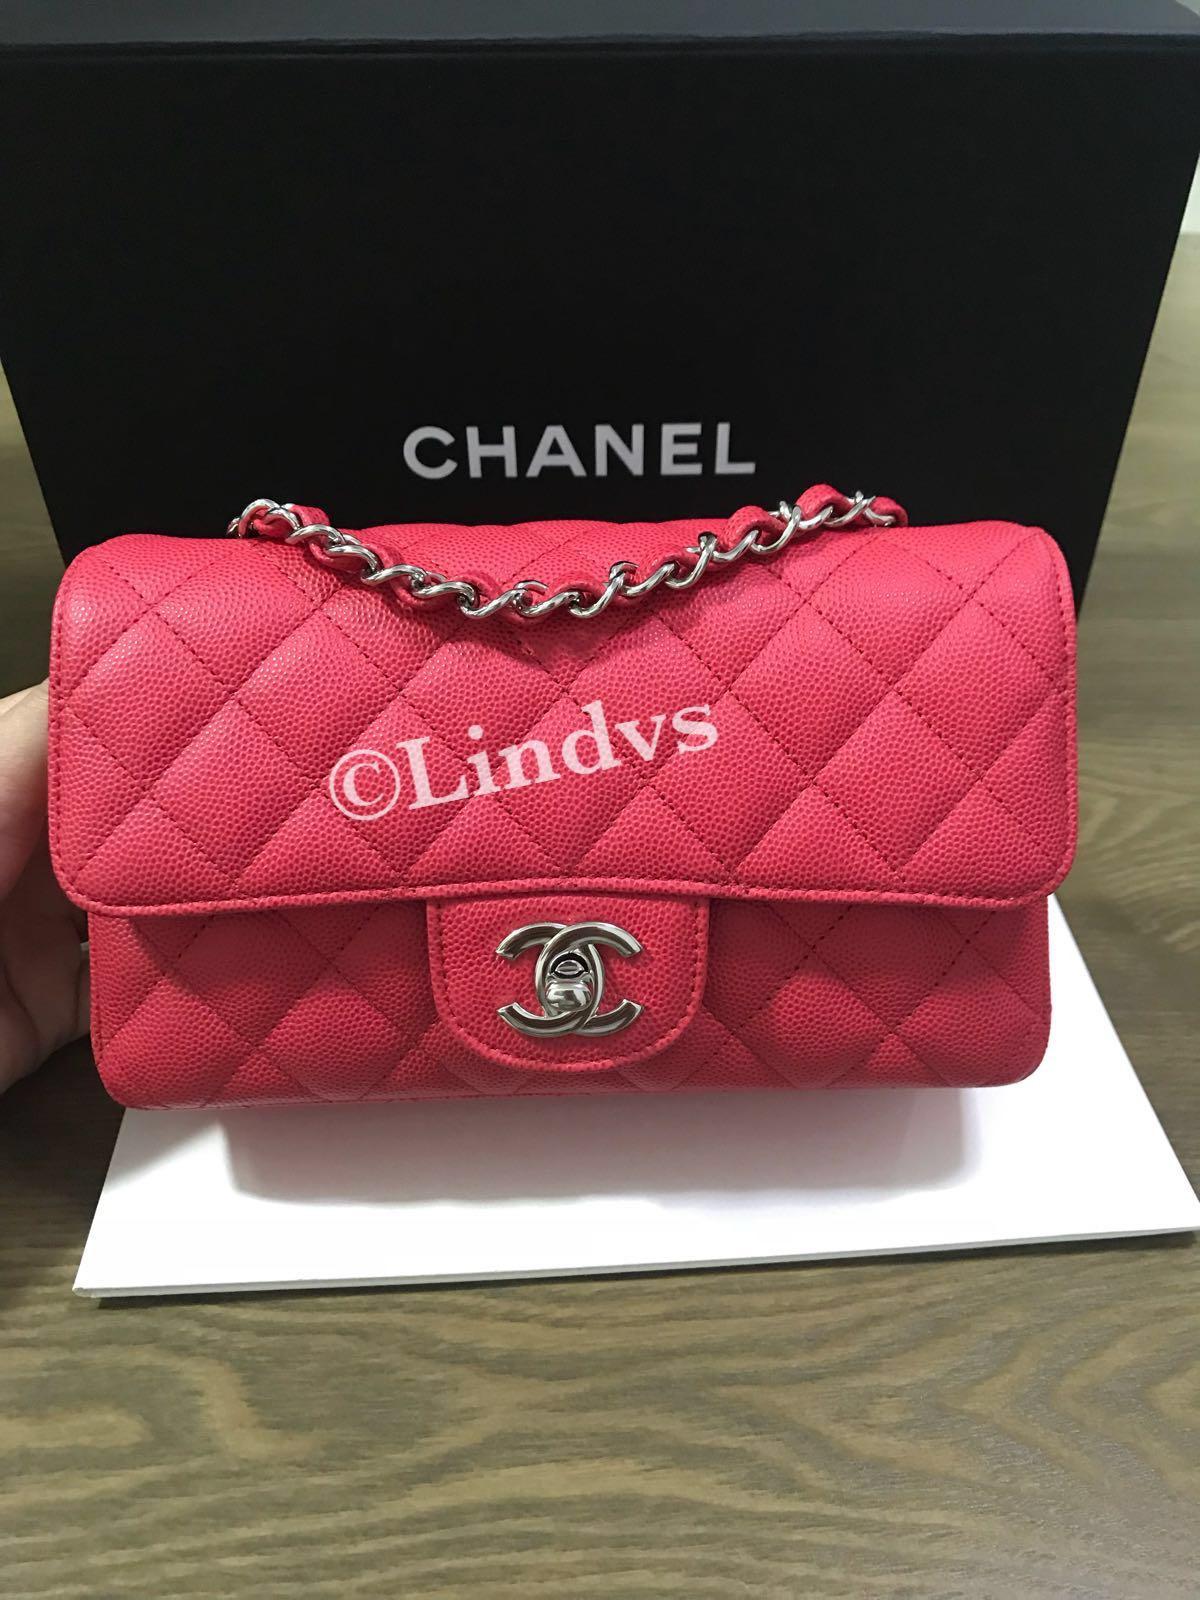 02faf66a8eff Chanel mini rectangular 18C (Authentic), Barangan Mewah, Beg dan ...